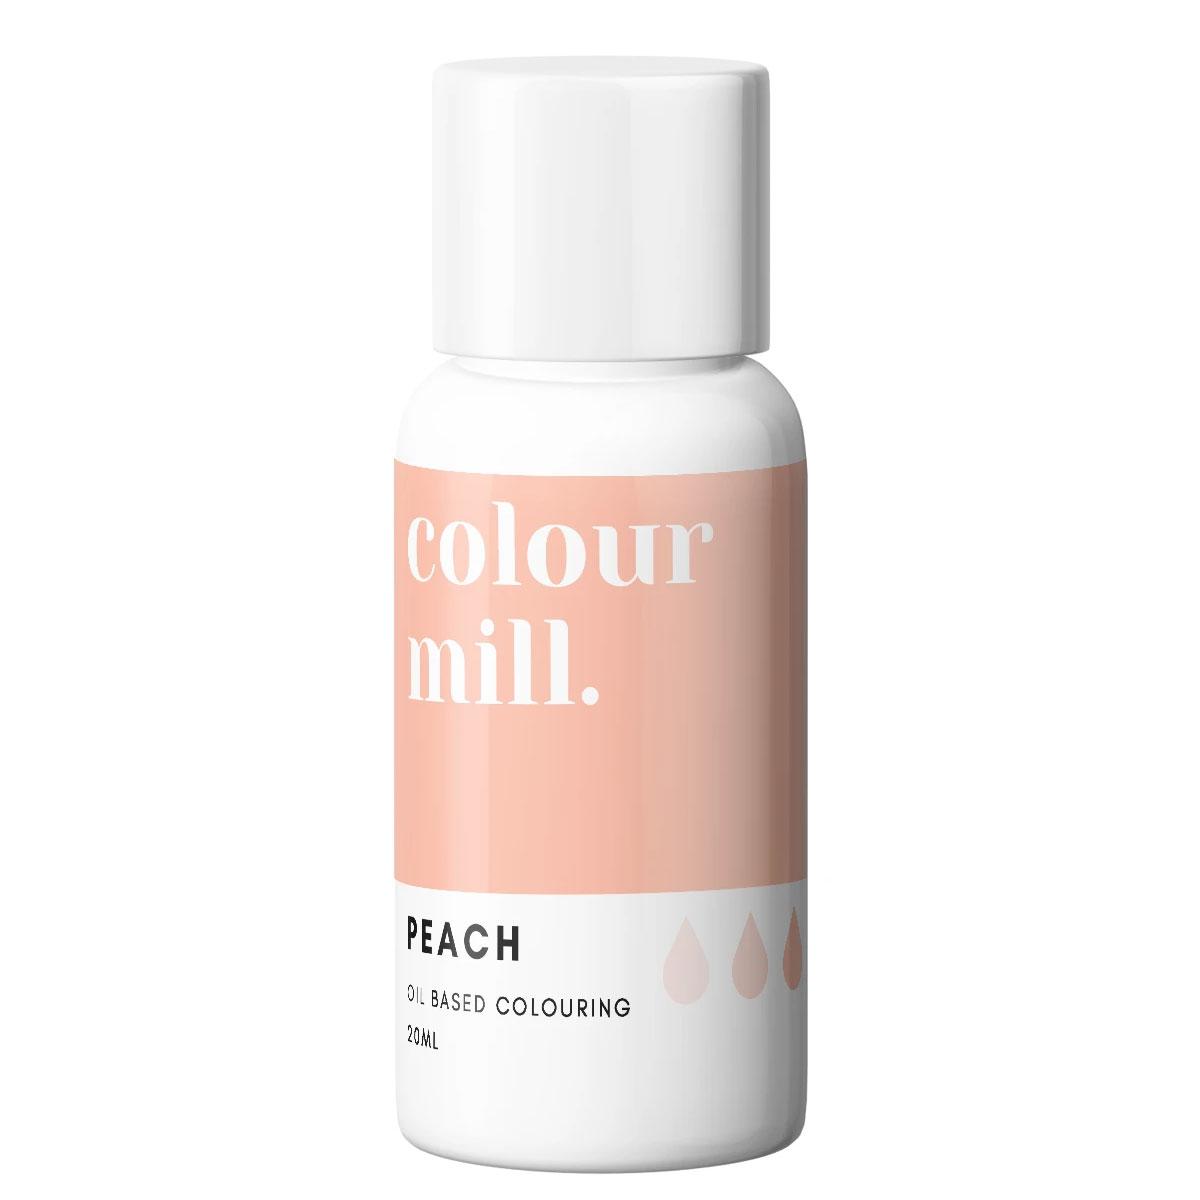 Colour Mill fettlösliche Lebensmittelfarbe - Peach 20ml